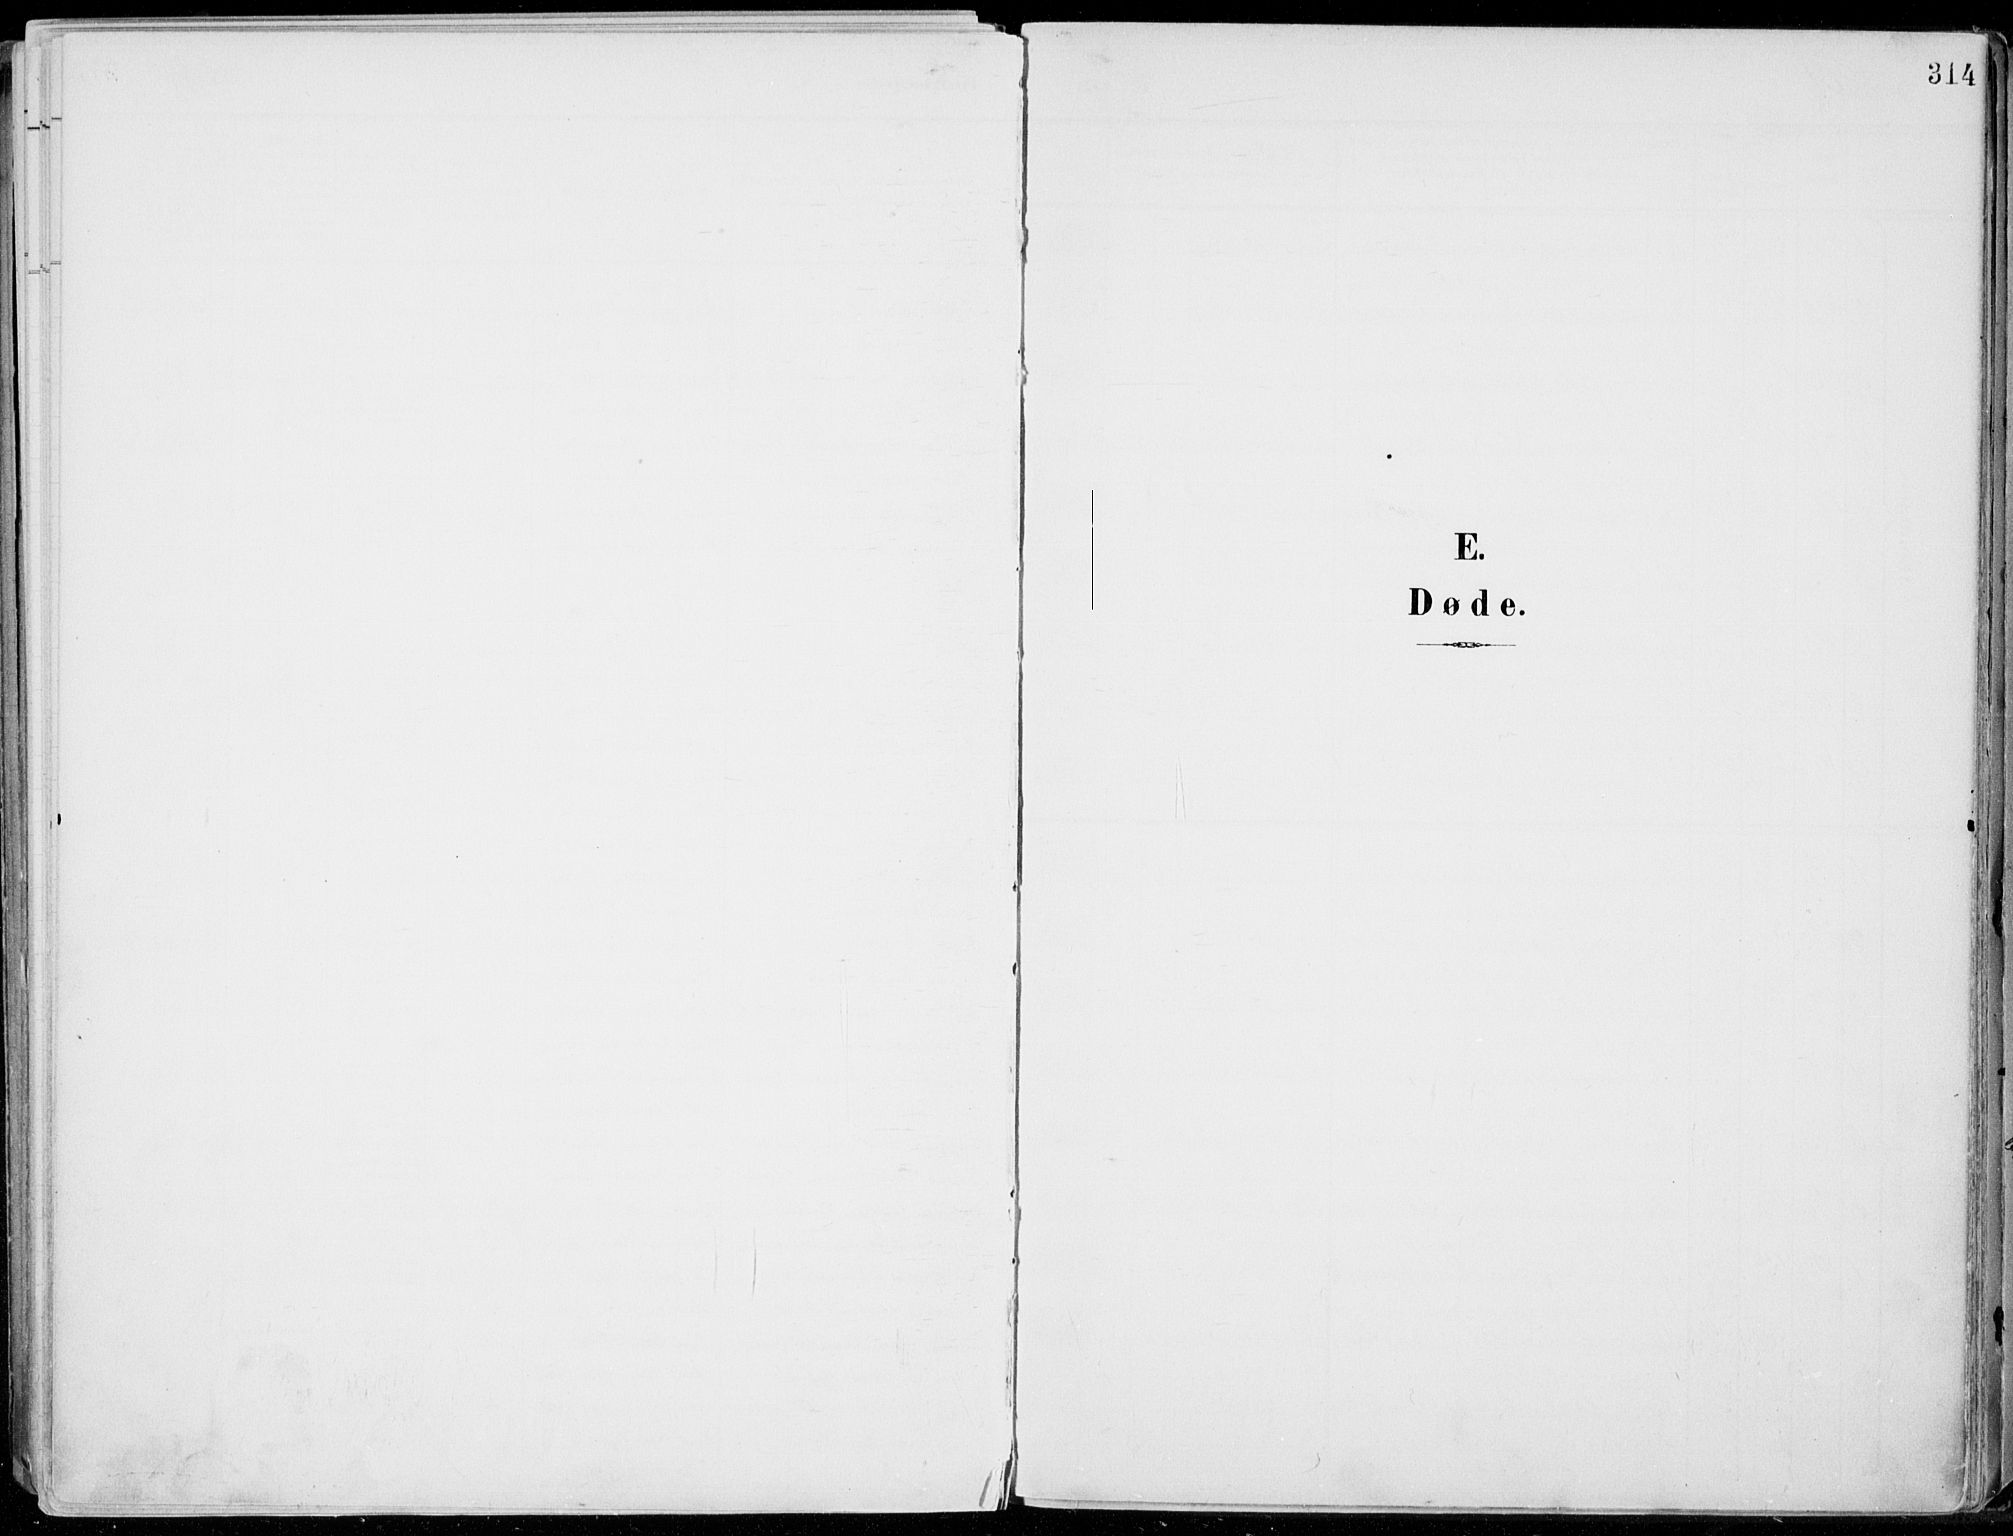 SAH, Lillehammer prestekontor, Ministerialbok nr. 1, 1901-1916, s. 314